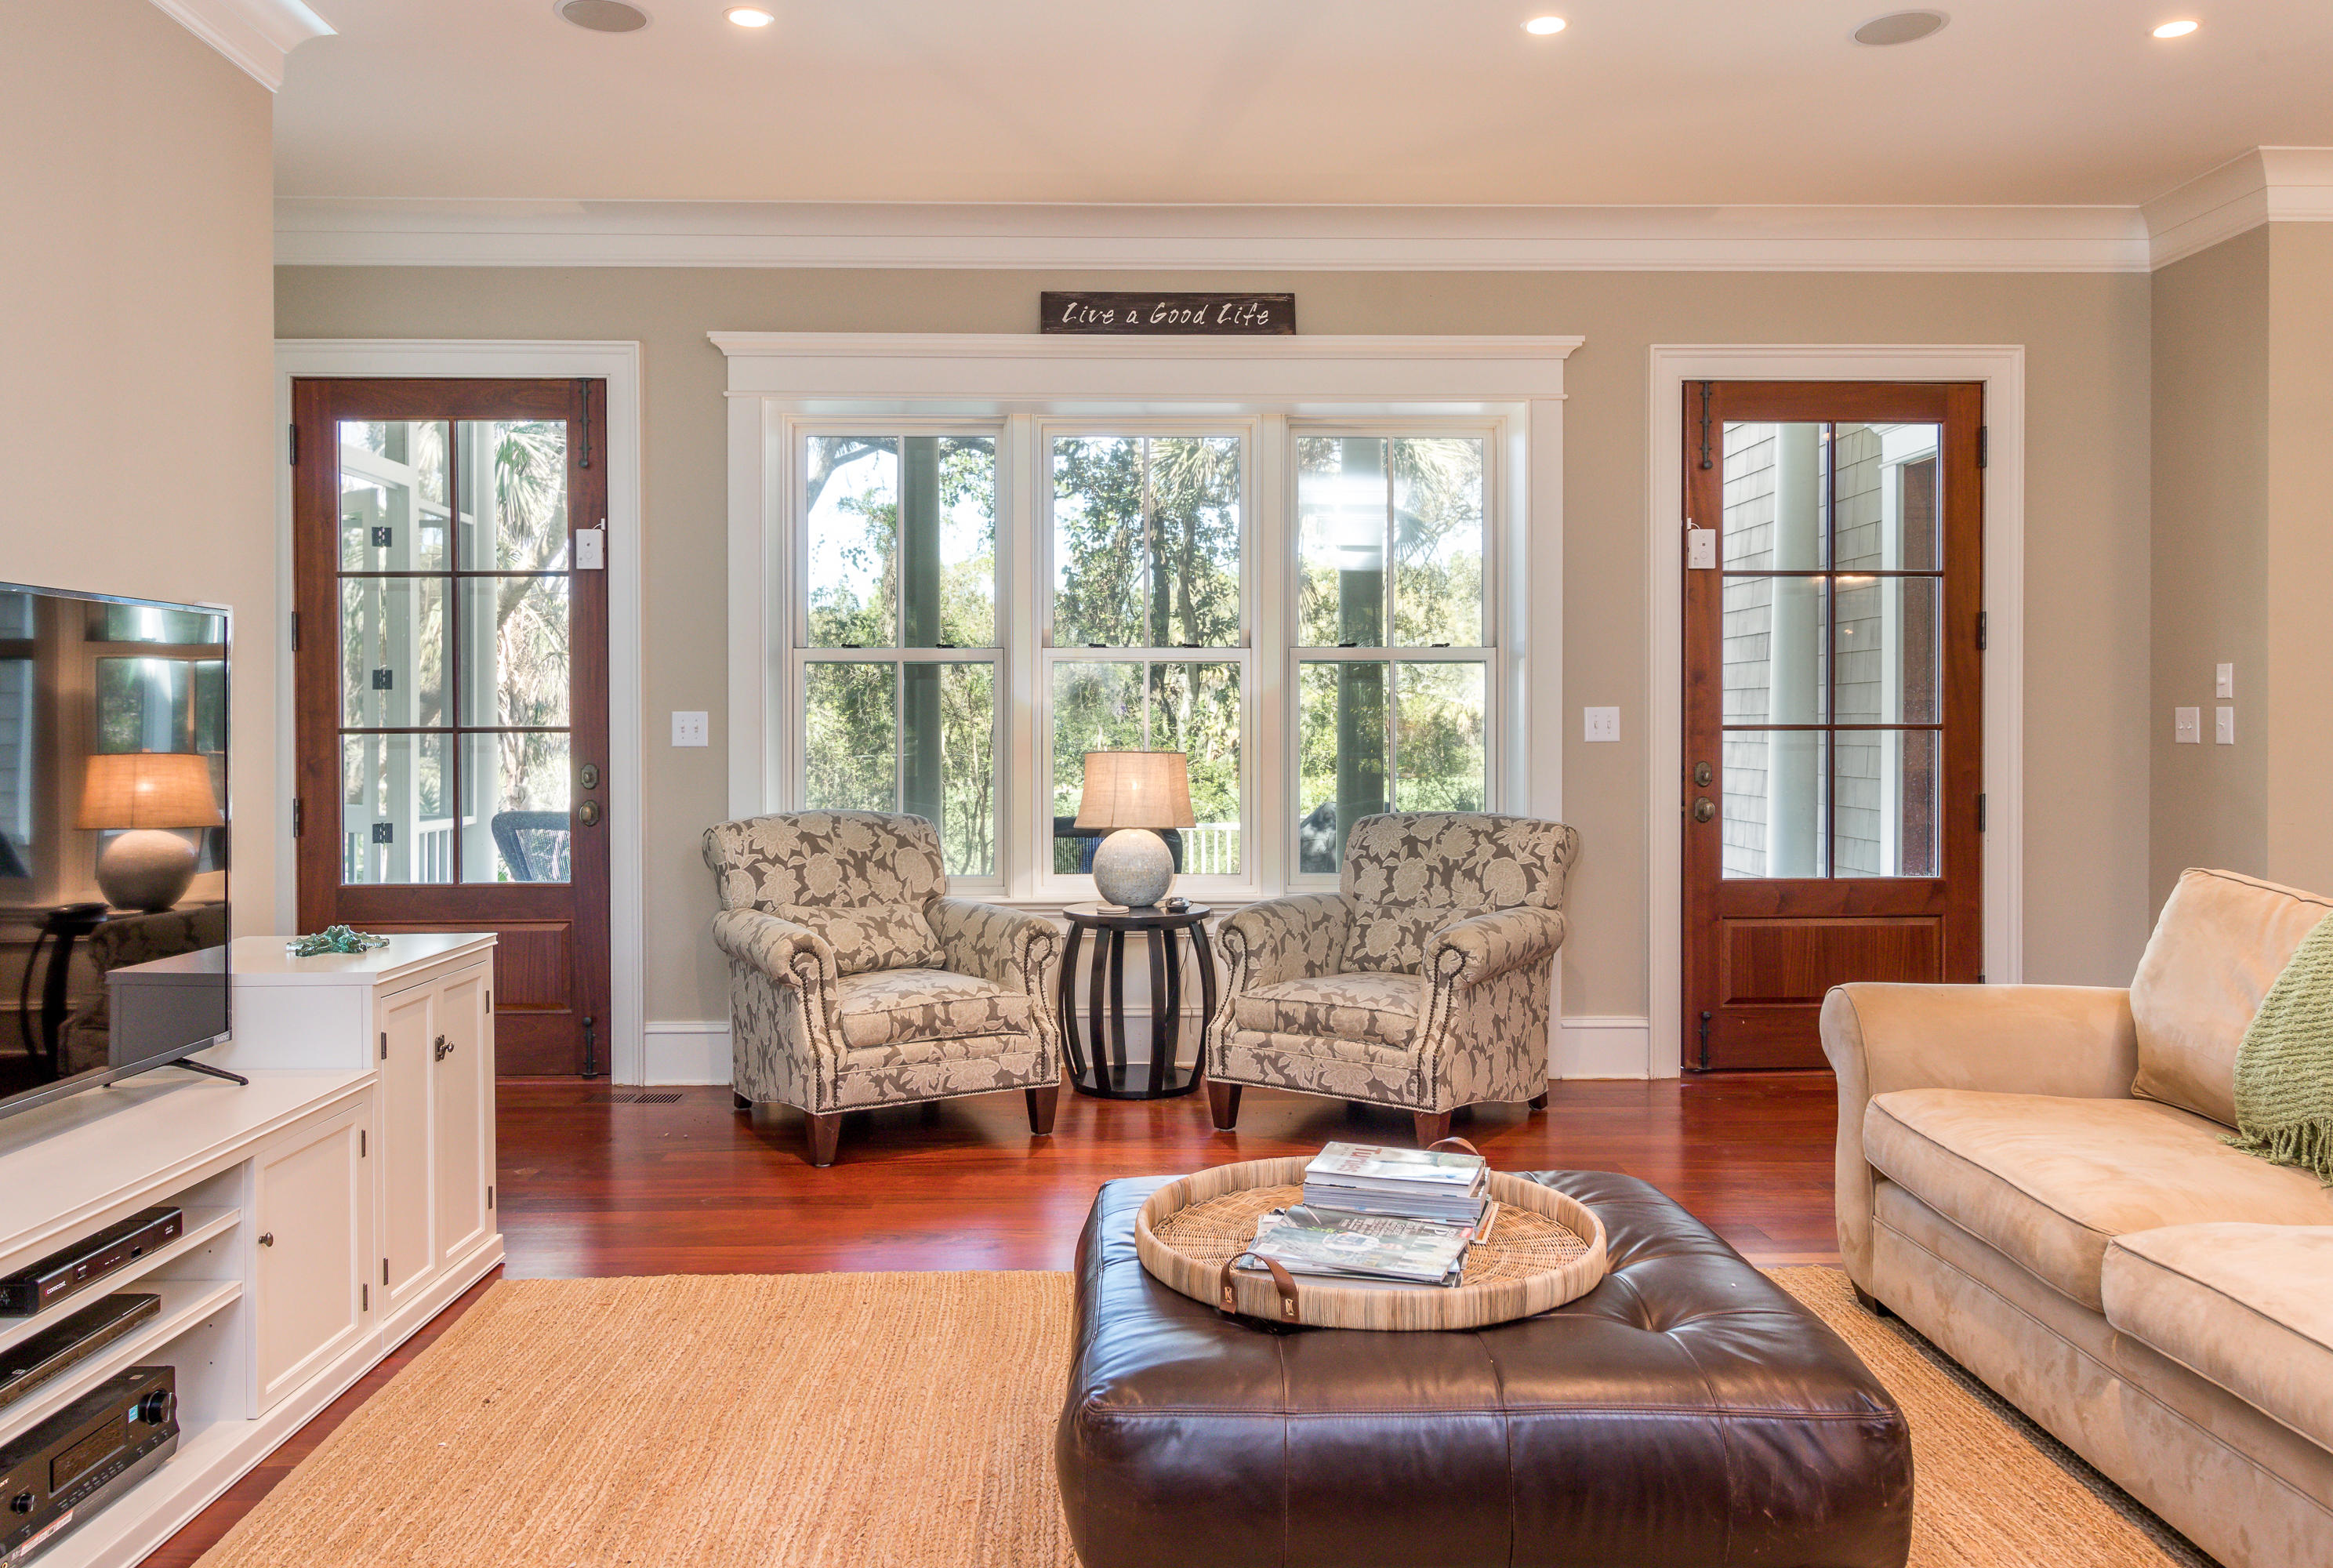 Egret/Pintail Homes For Sale - 117 Bufflehead, Kiawah Island, SC - 31